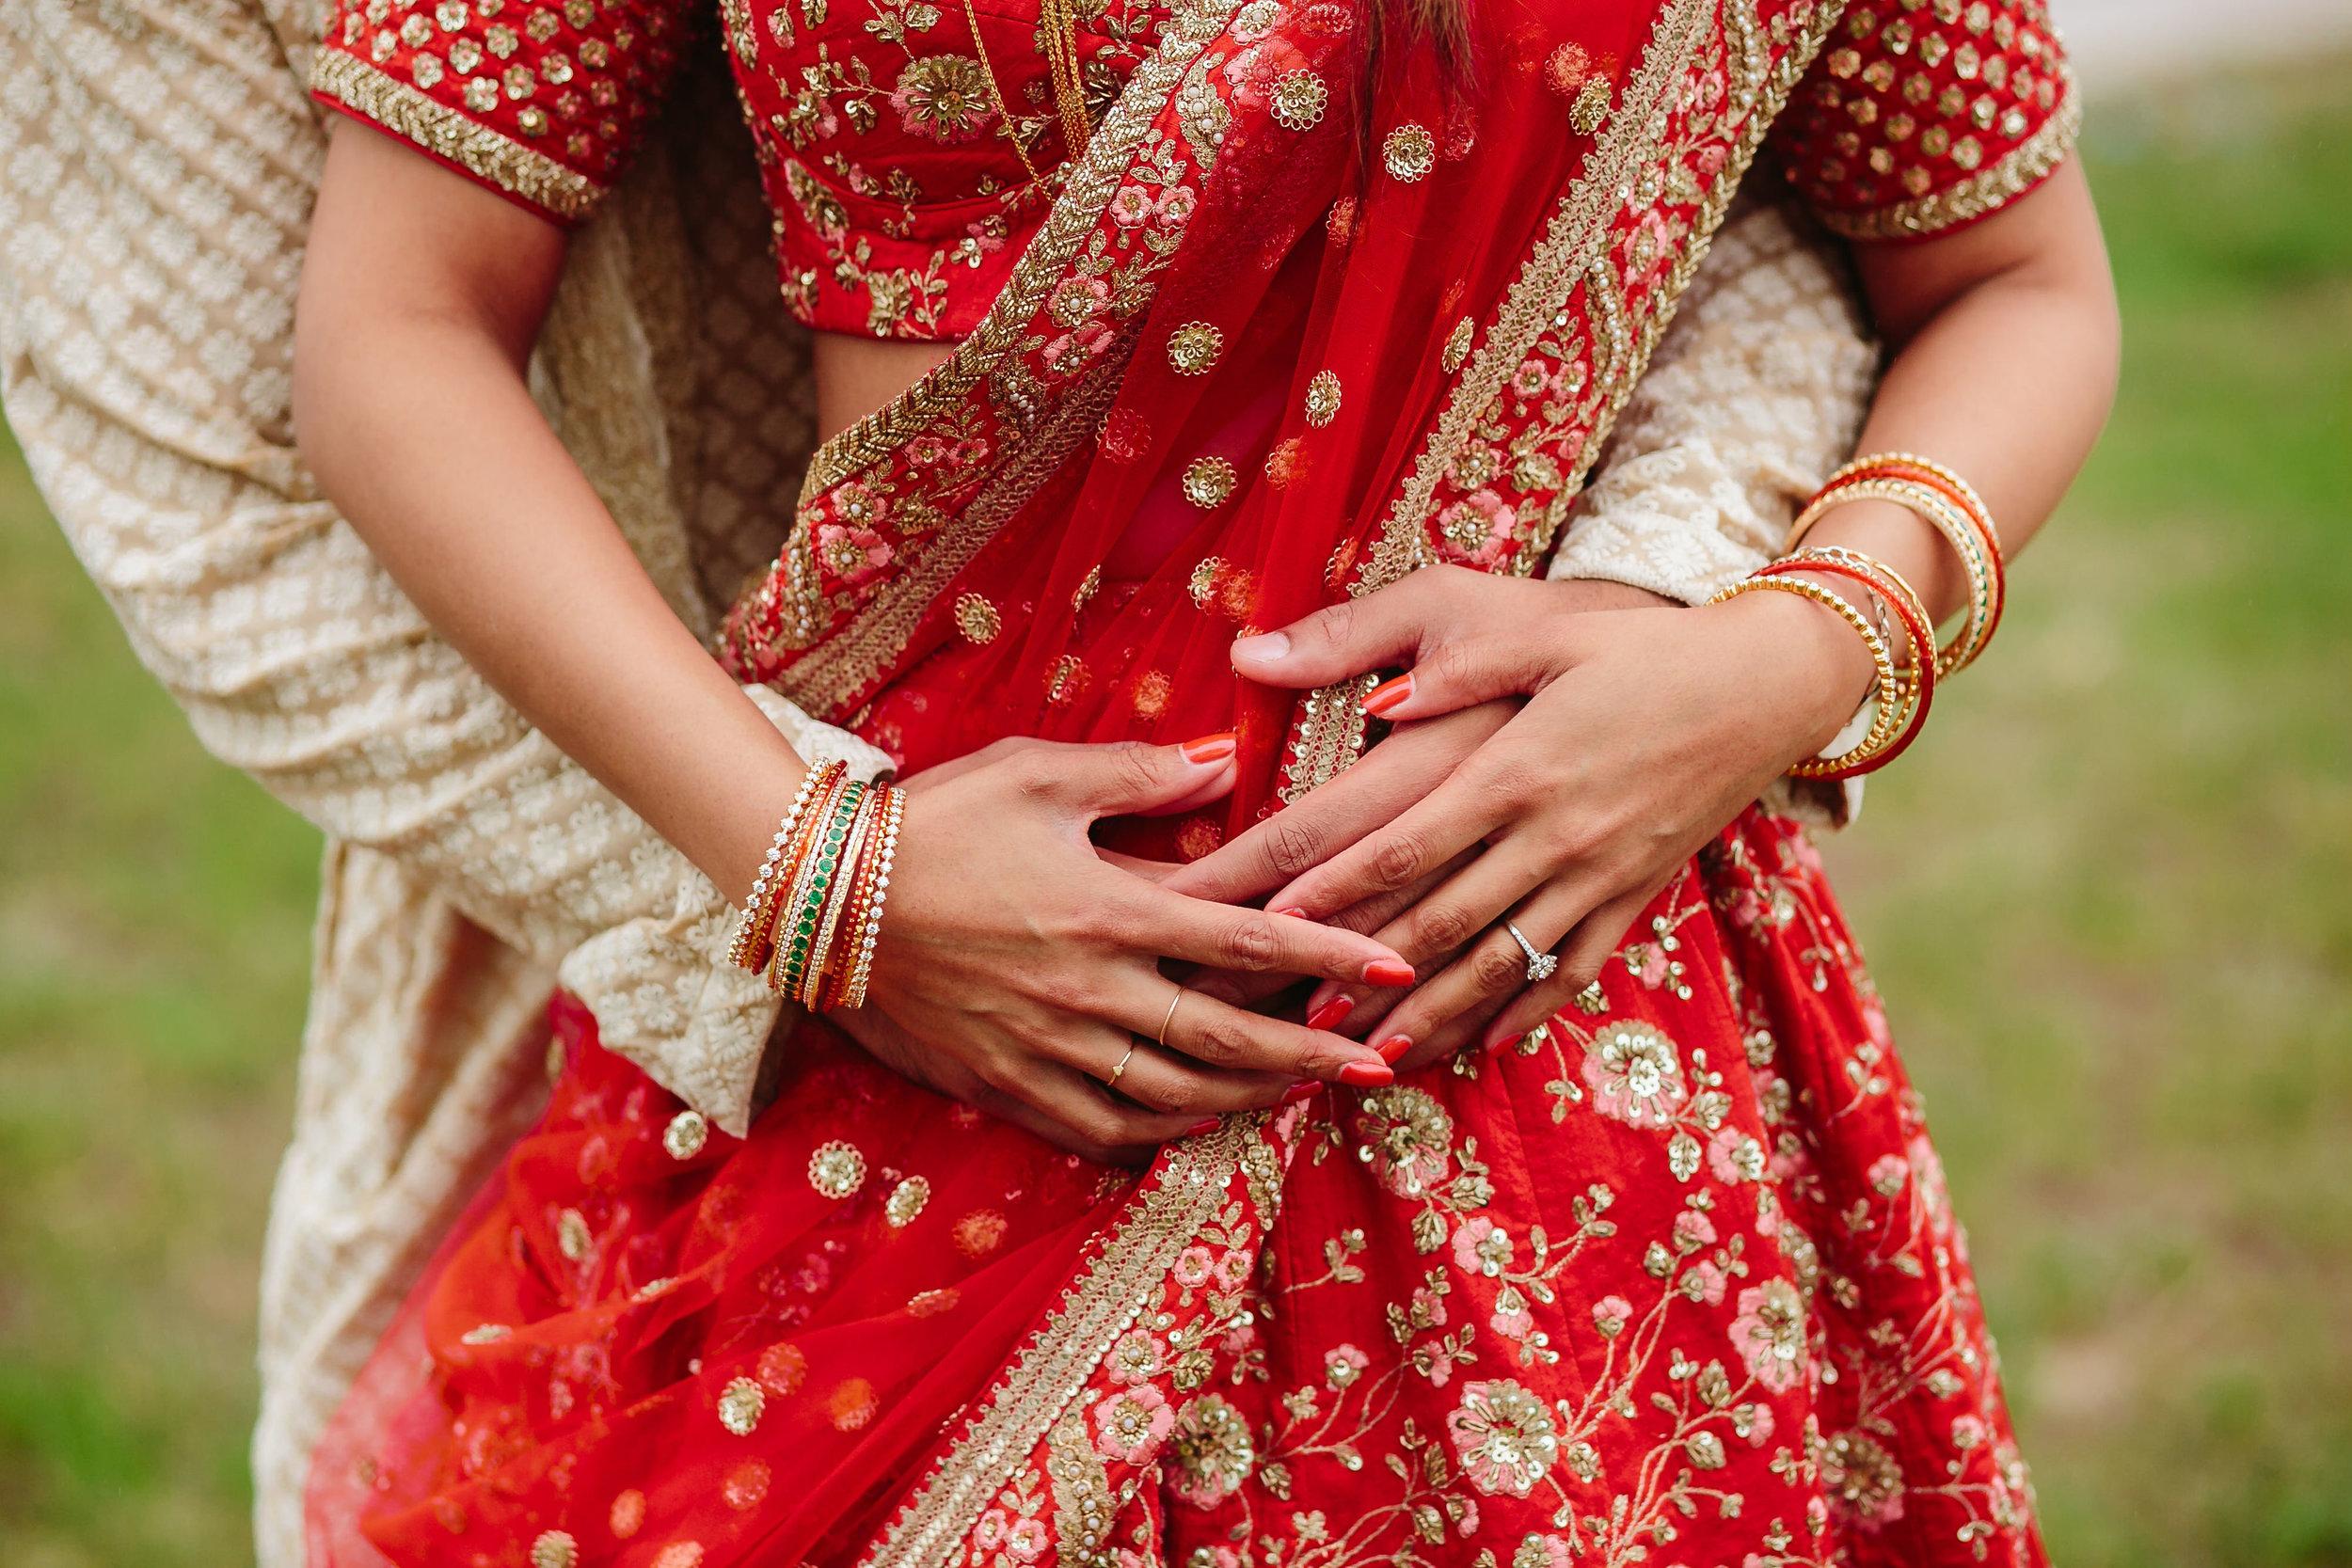 INDIAN WEDDING JEWELRY BRIDE AND GROOM.jpg